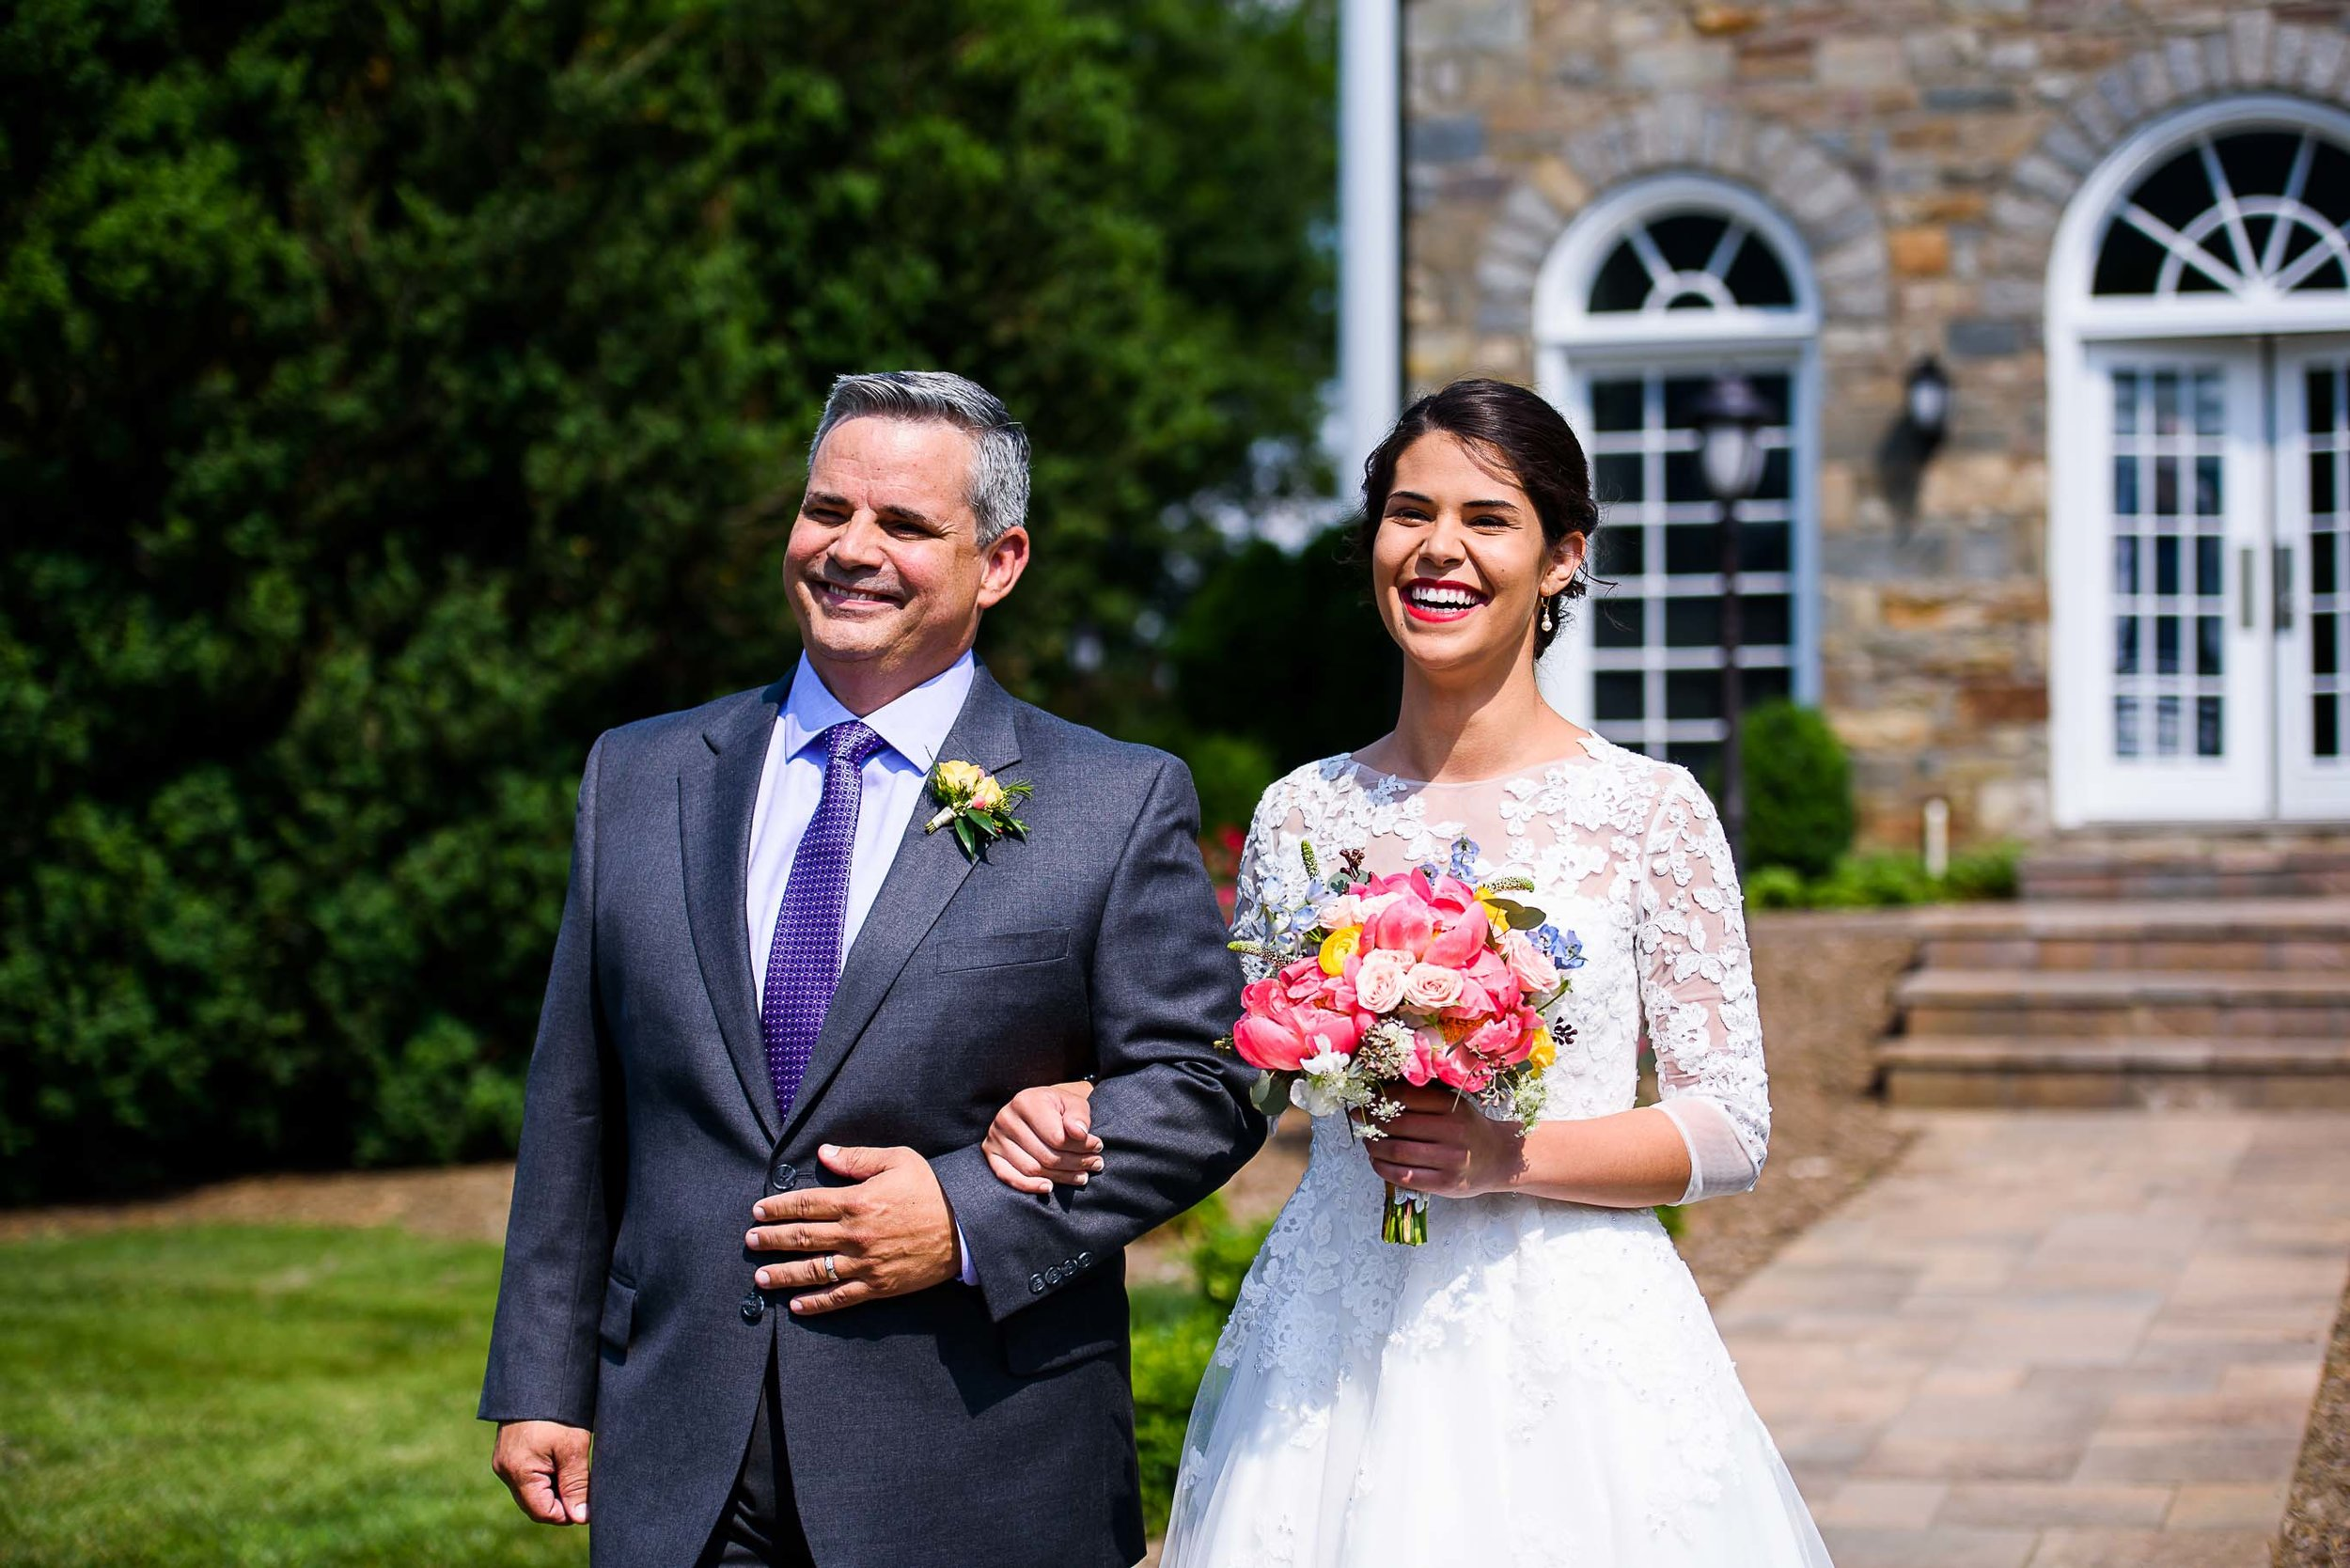 Evergreen Country Club wedding photos35.jpg